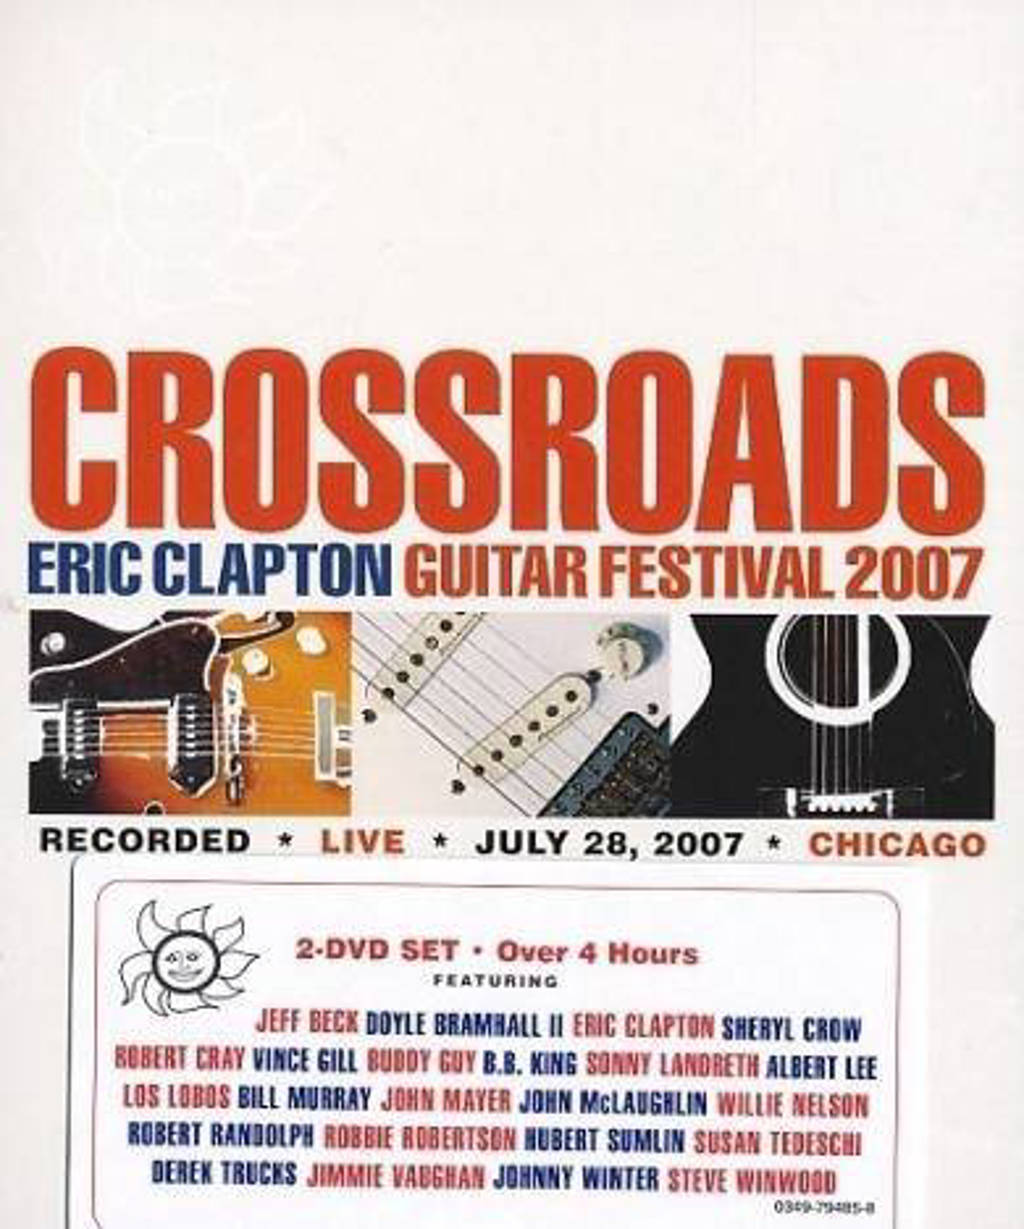 Eric Clapton - Crossroads Festival 07 (Jewel) (DVD)